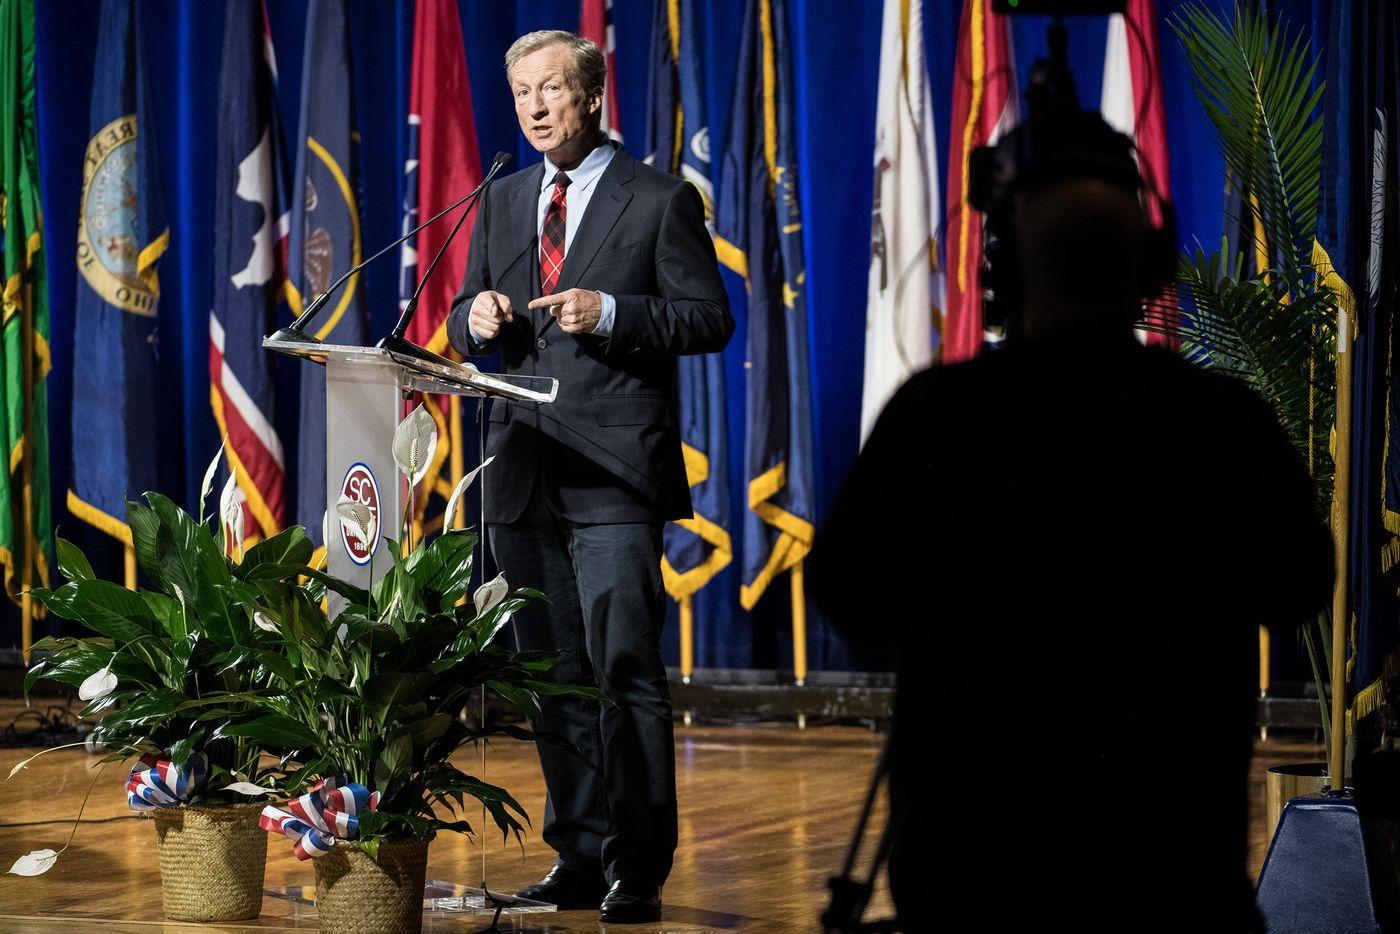 NY MAG – Who Could Breach Joe Biden's 'Firewall' in South Carolina?